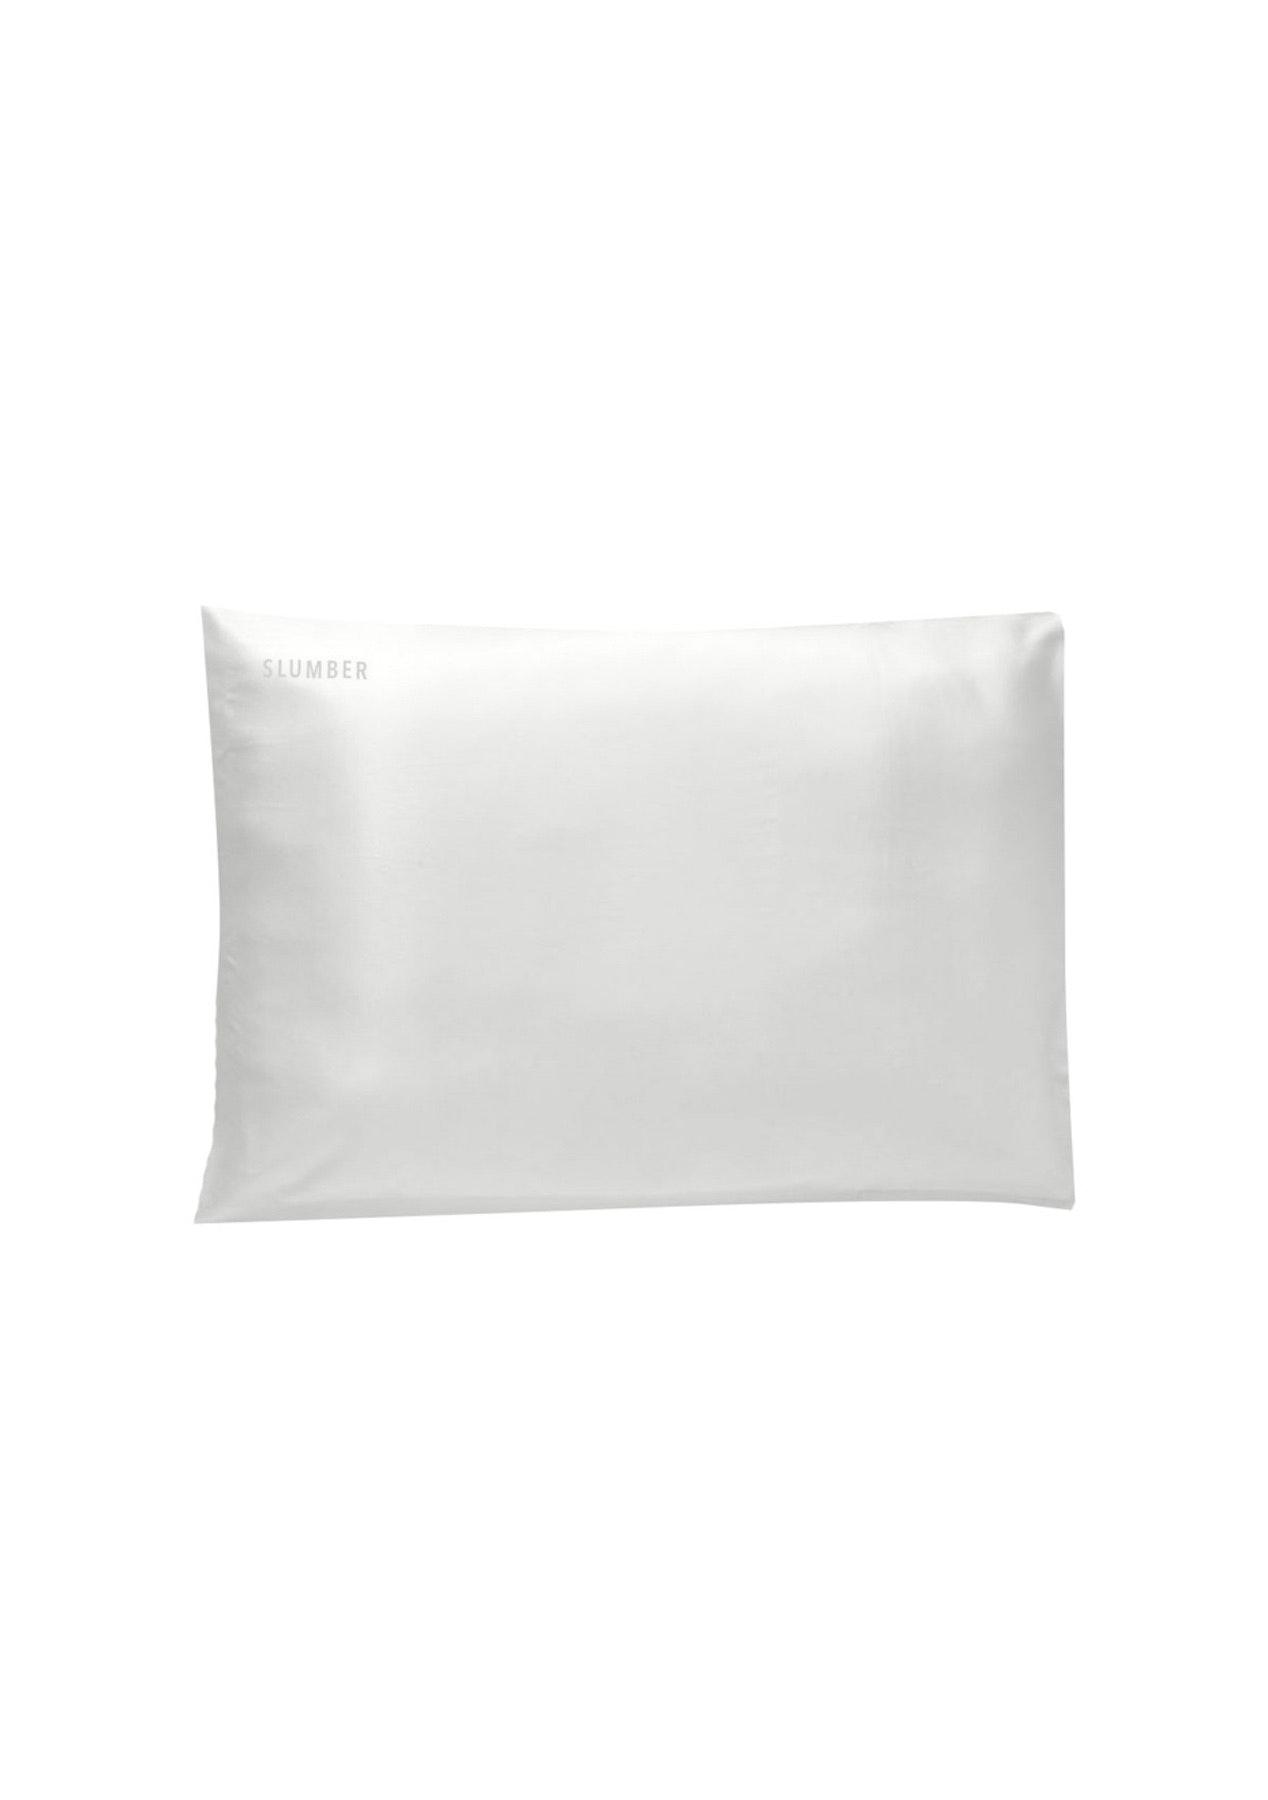 SLUMBER 100%  SILK PILLOWCASE - TWO PACK - Off White